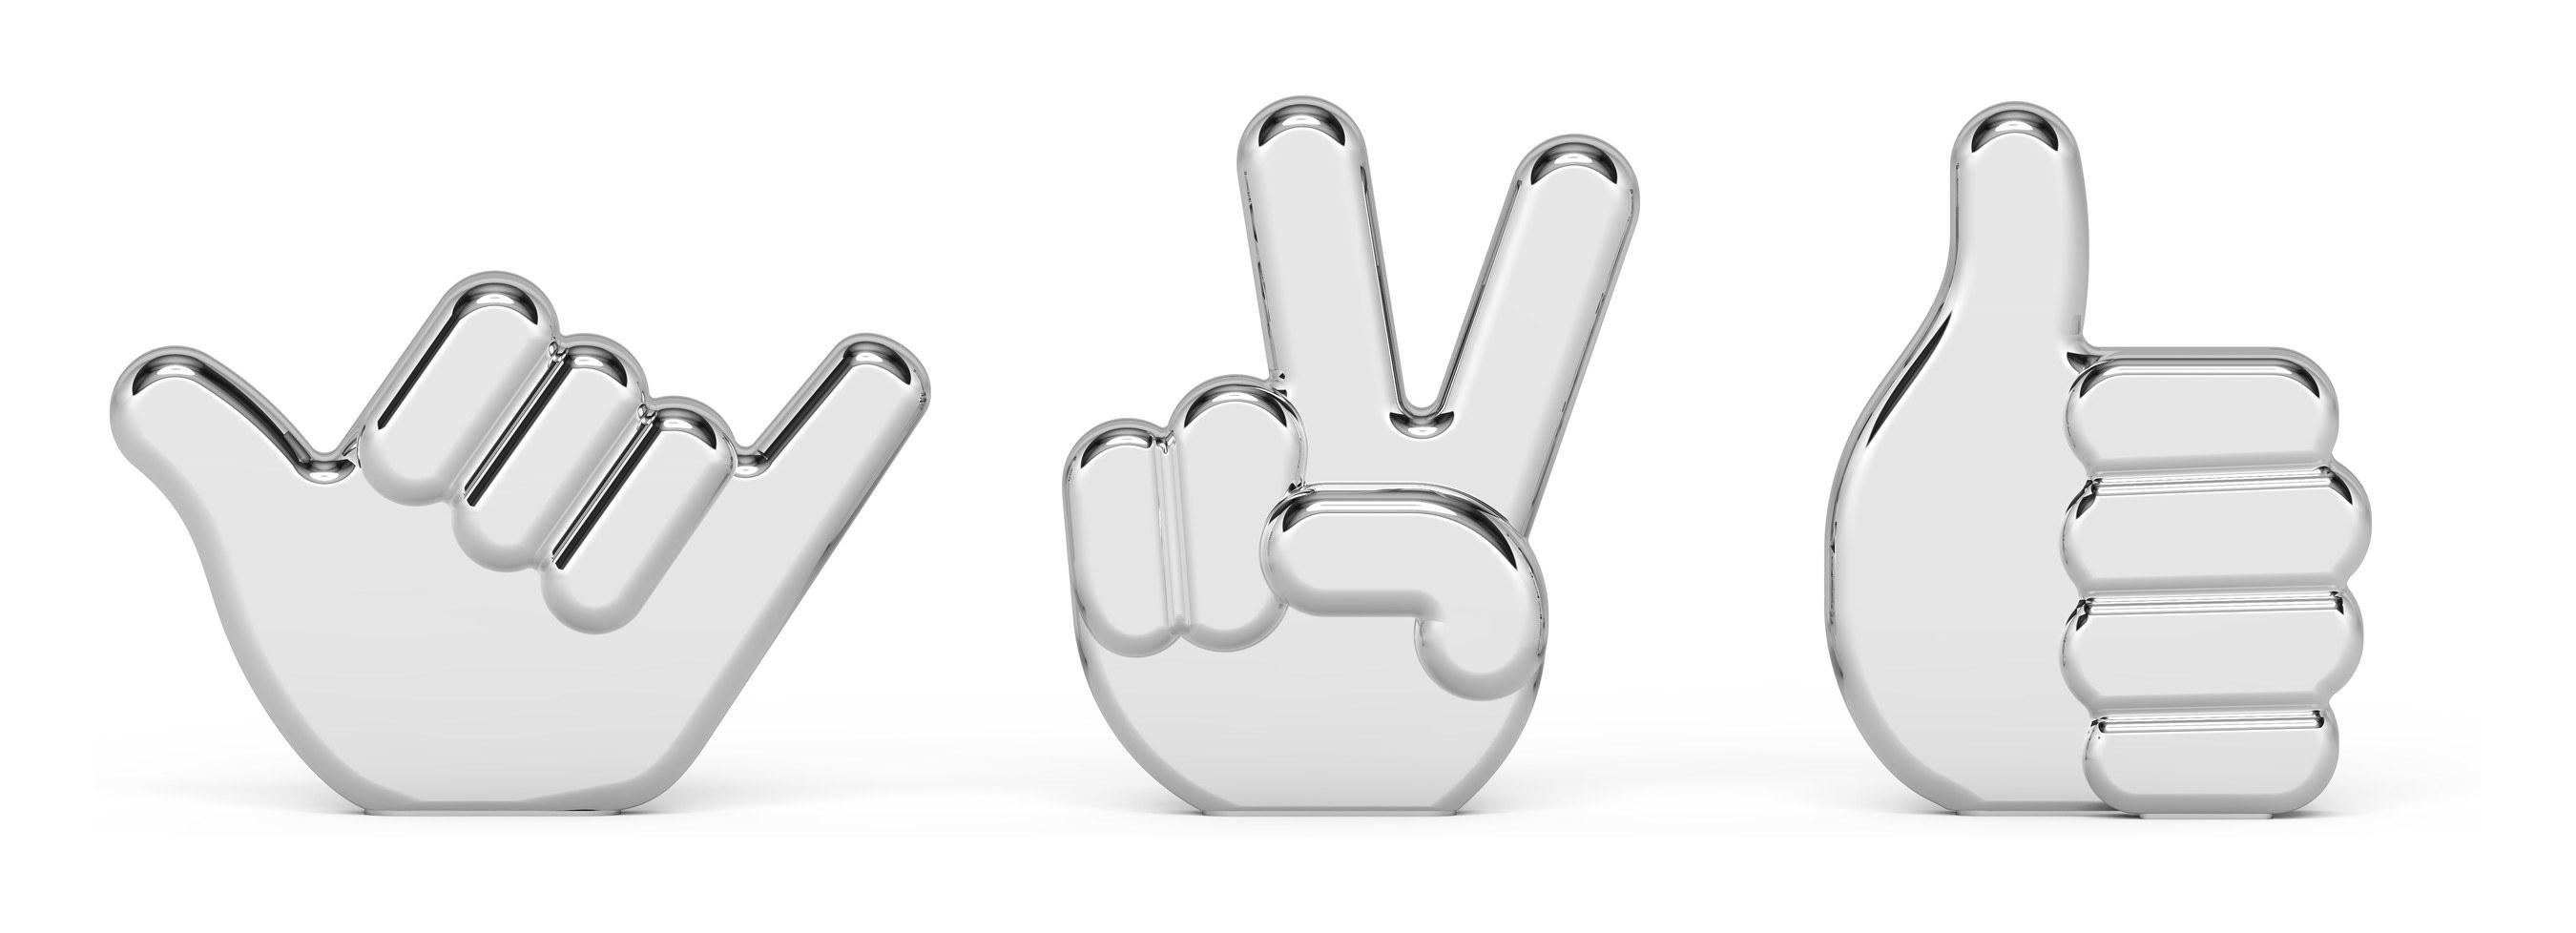 Rámček Handsup 3